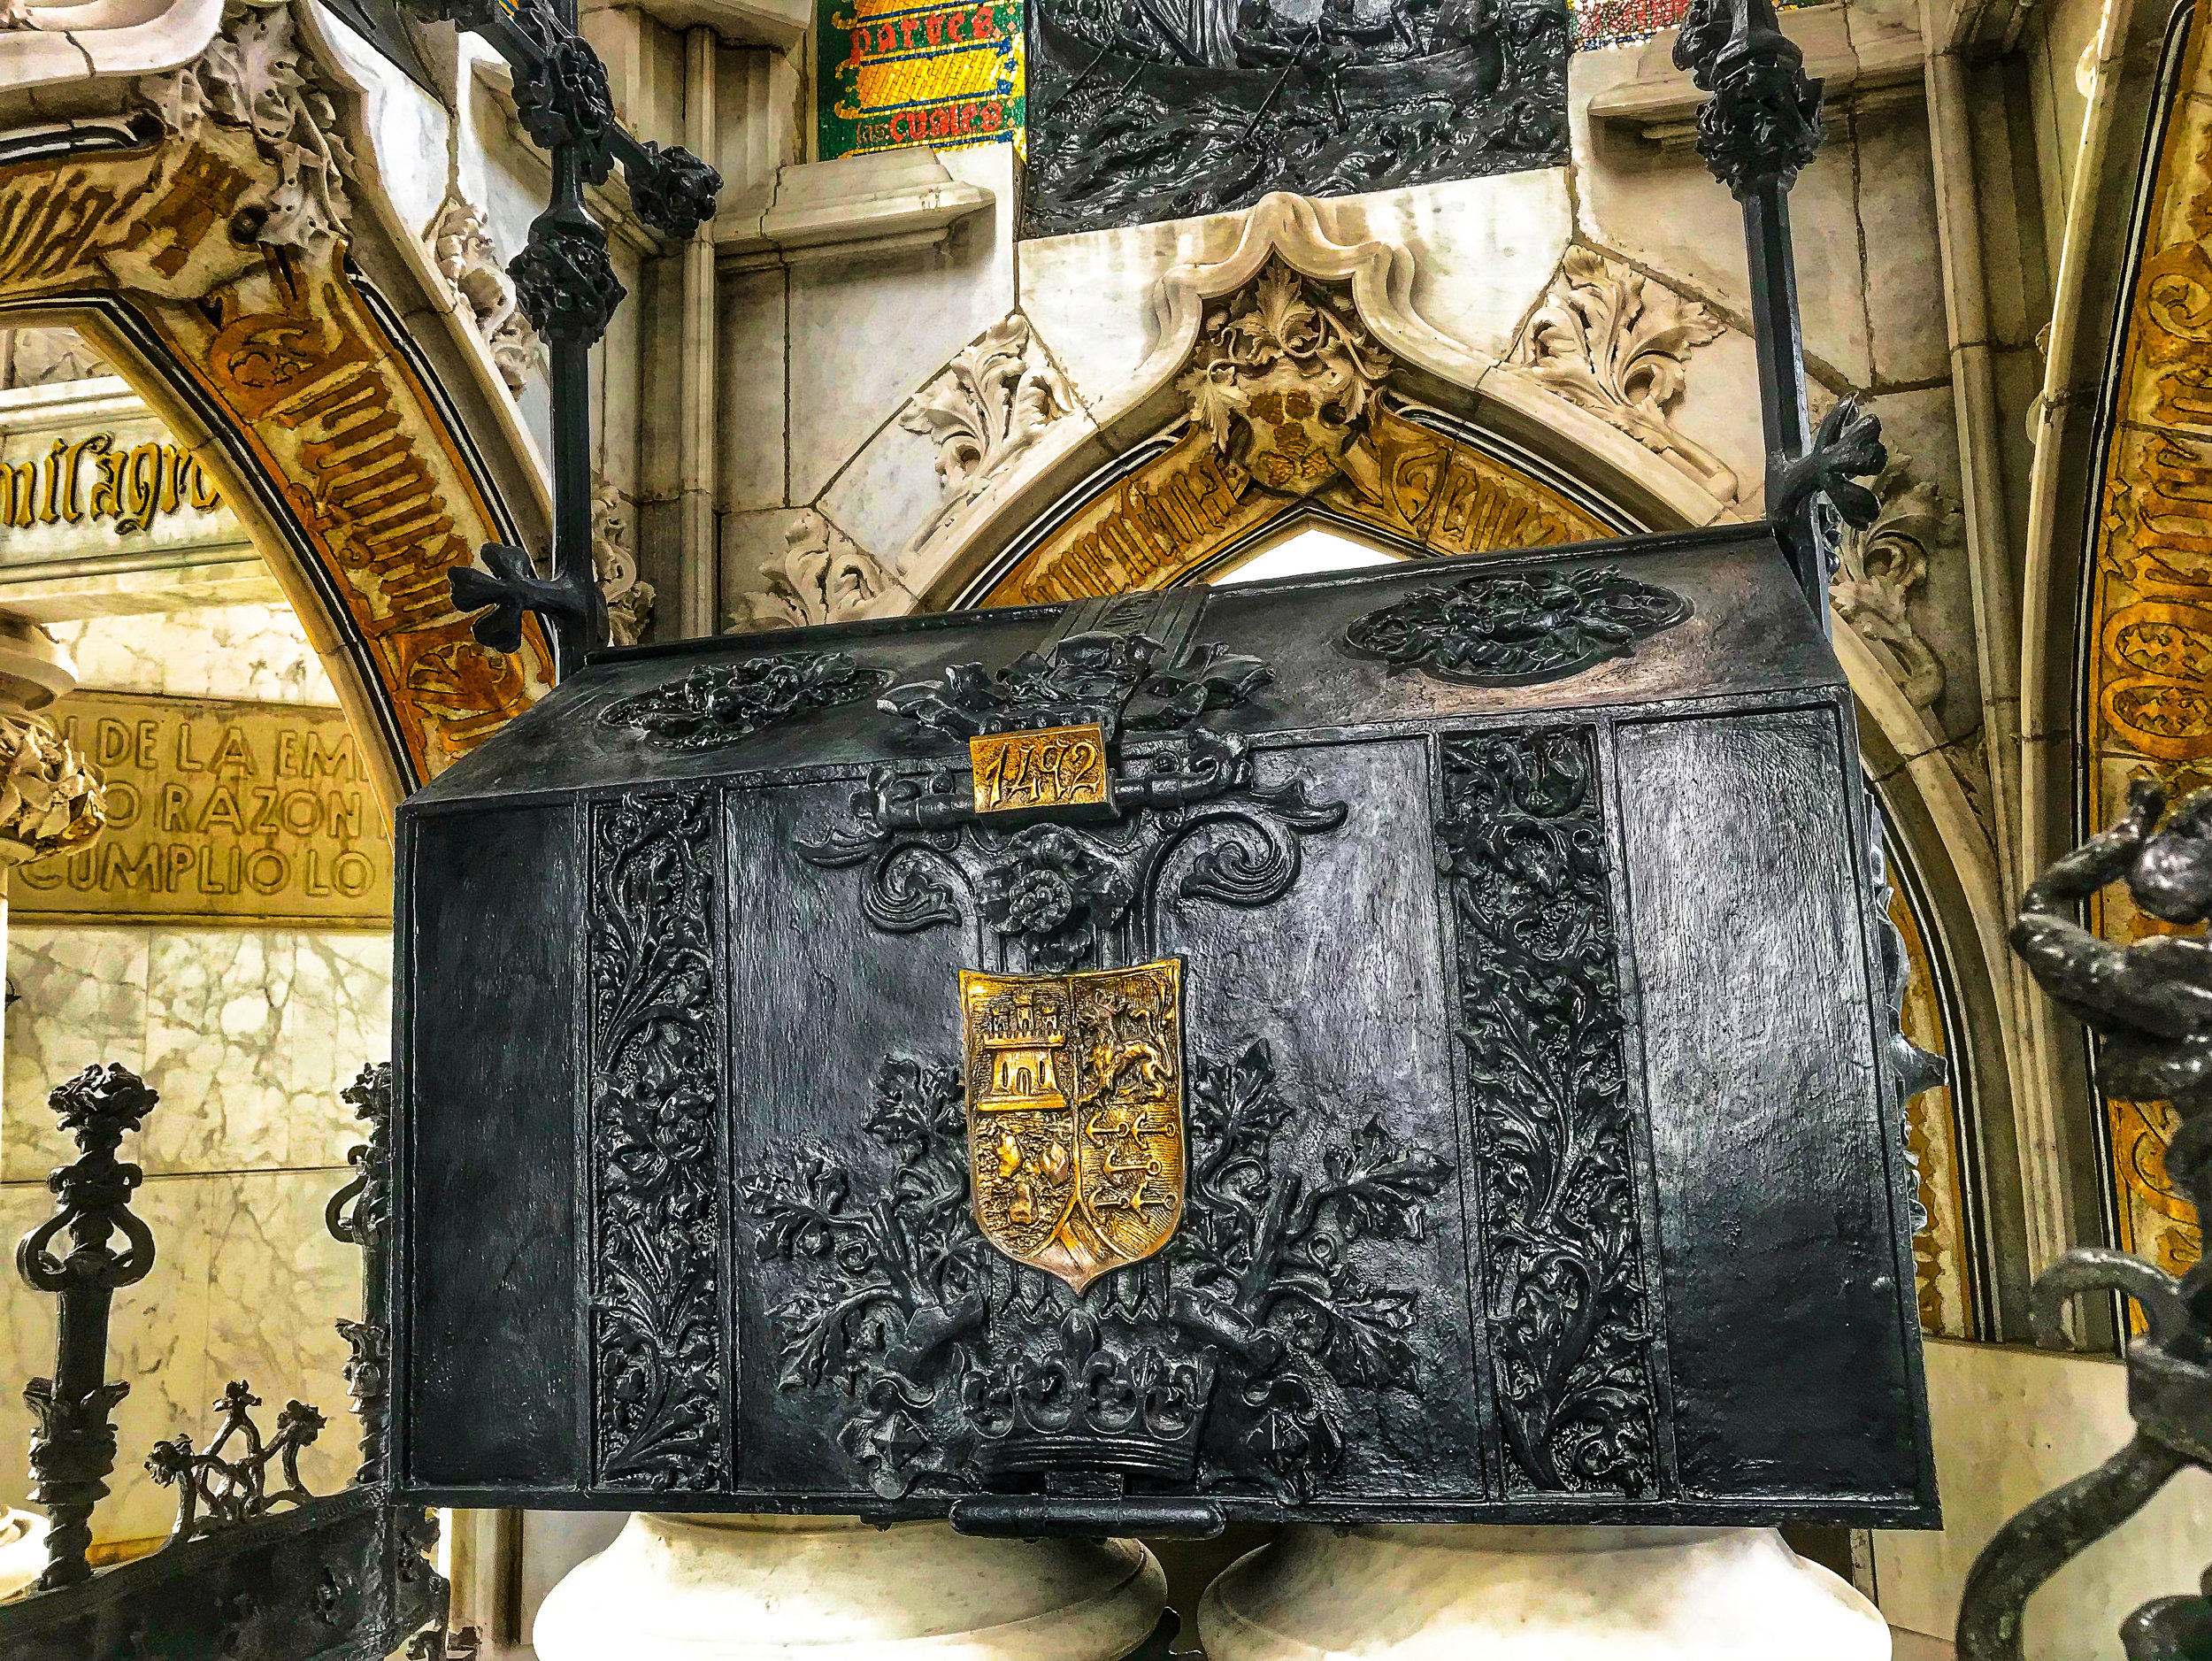 Sarcophagus of Christopher Columbus